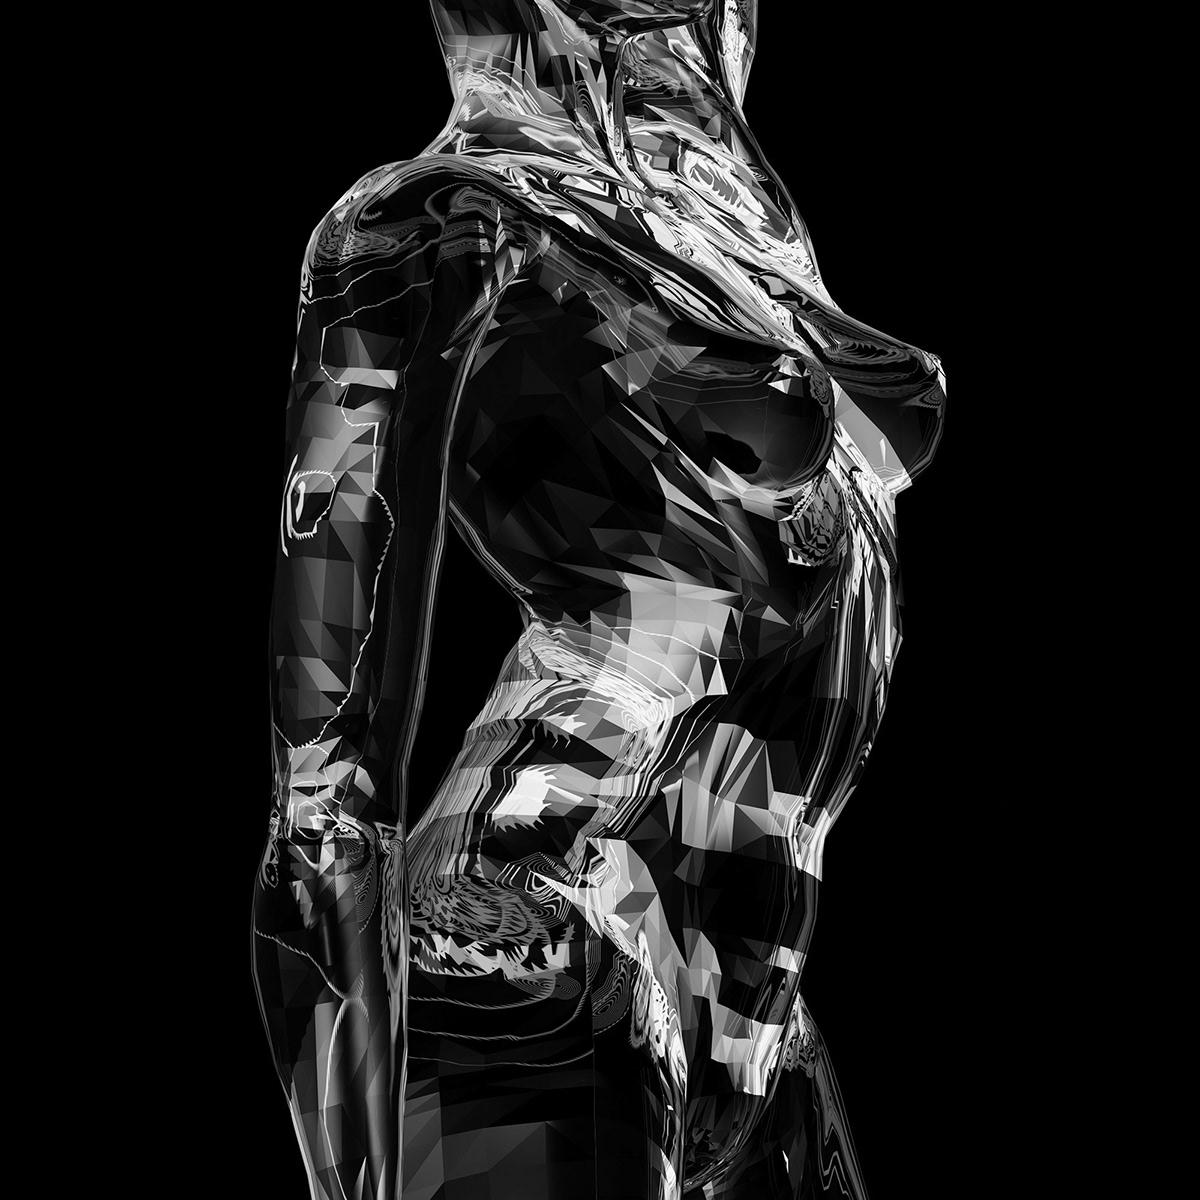 Cyrstalline bodyart figure 3D figure pattern sculpture Digital Art  pose model 3D Modelling